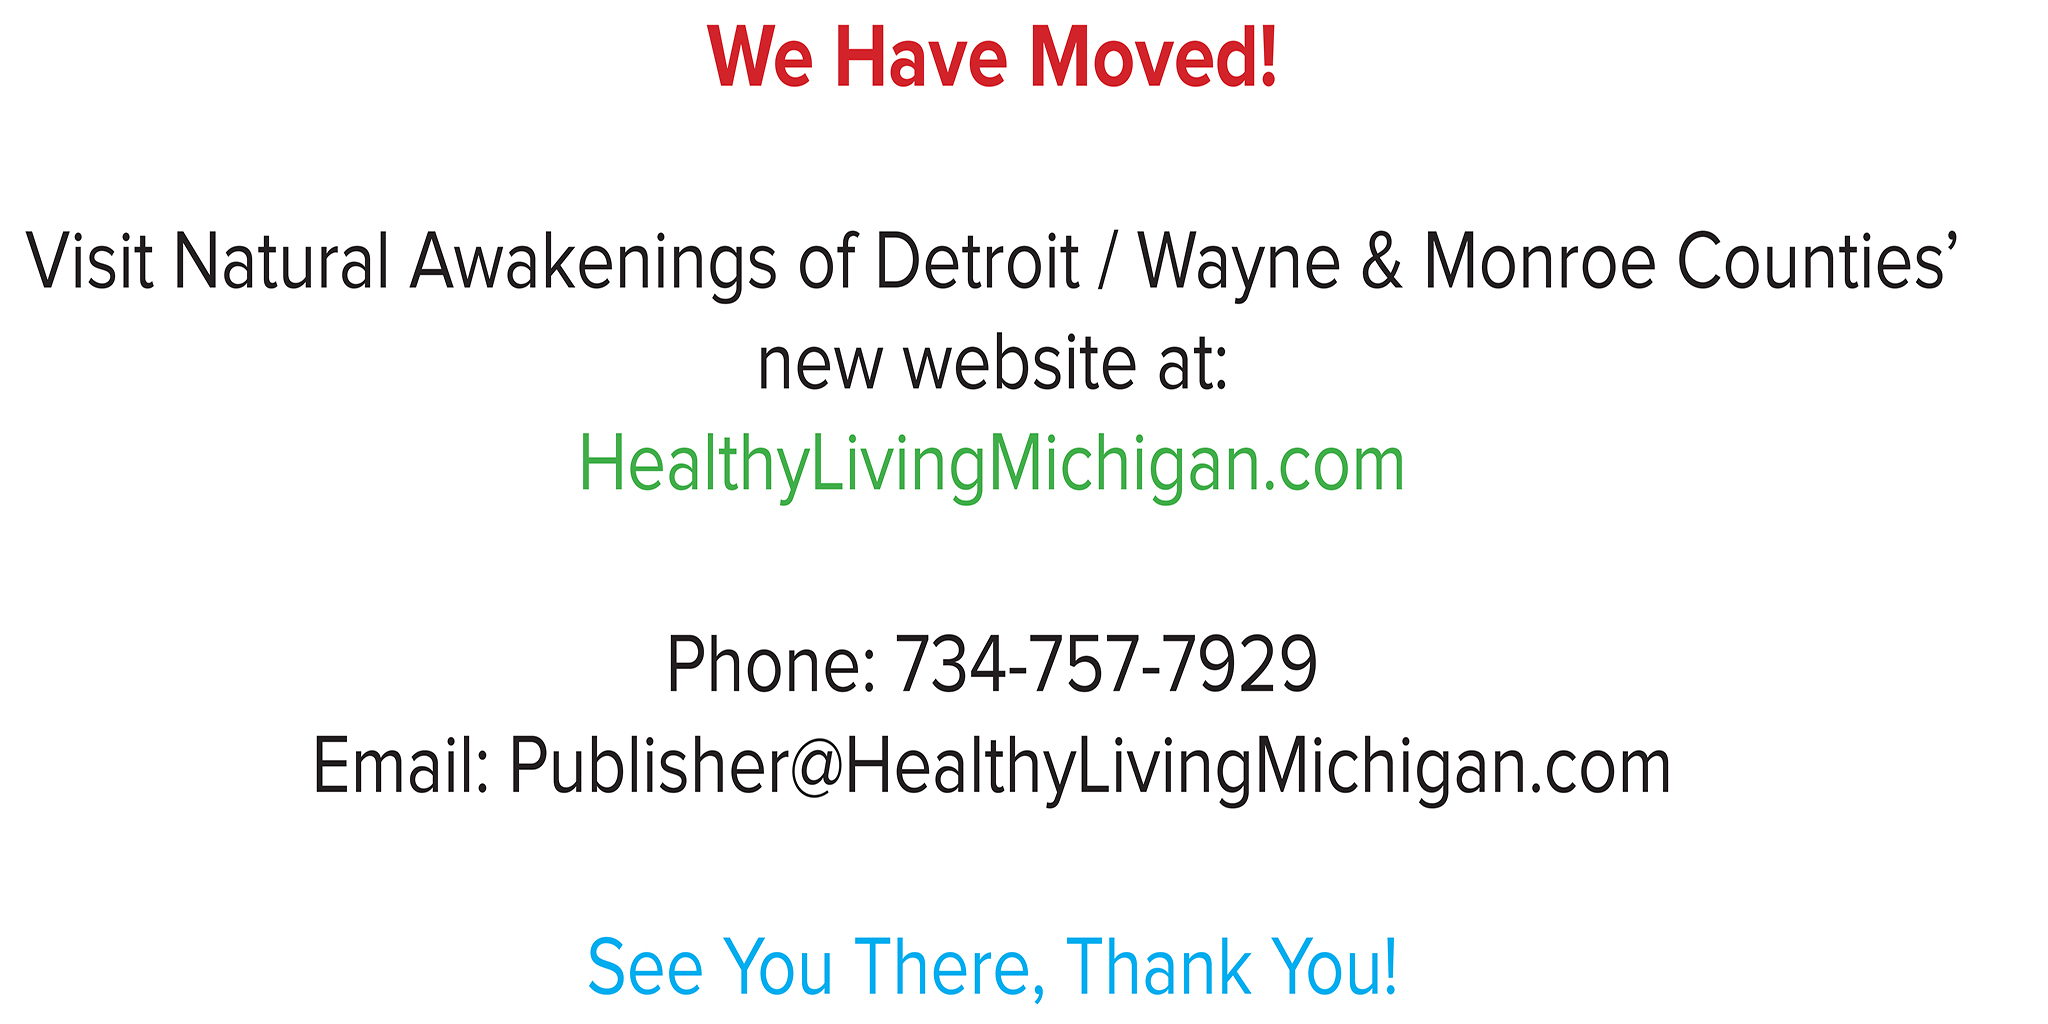 Redirect to HealthyLivingMichigan